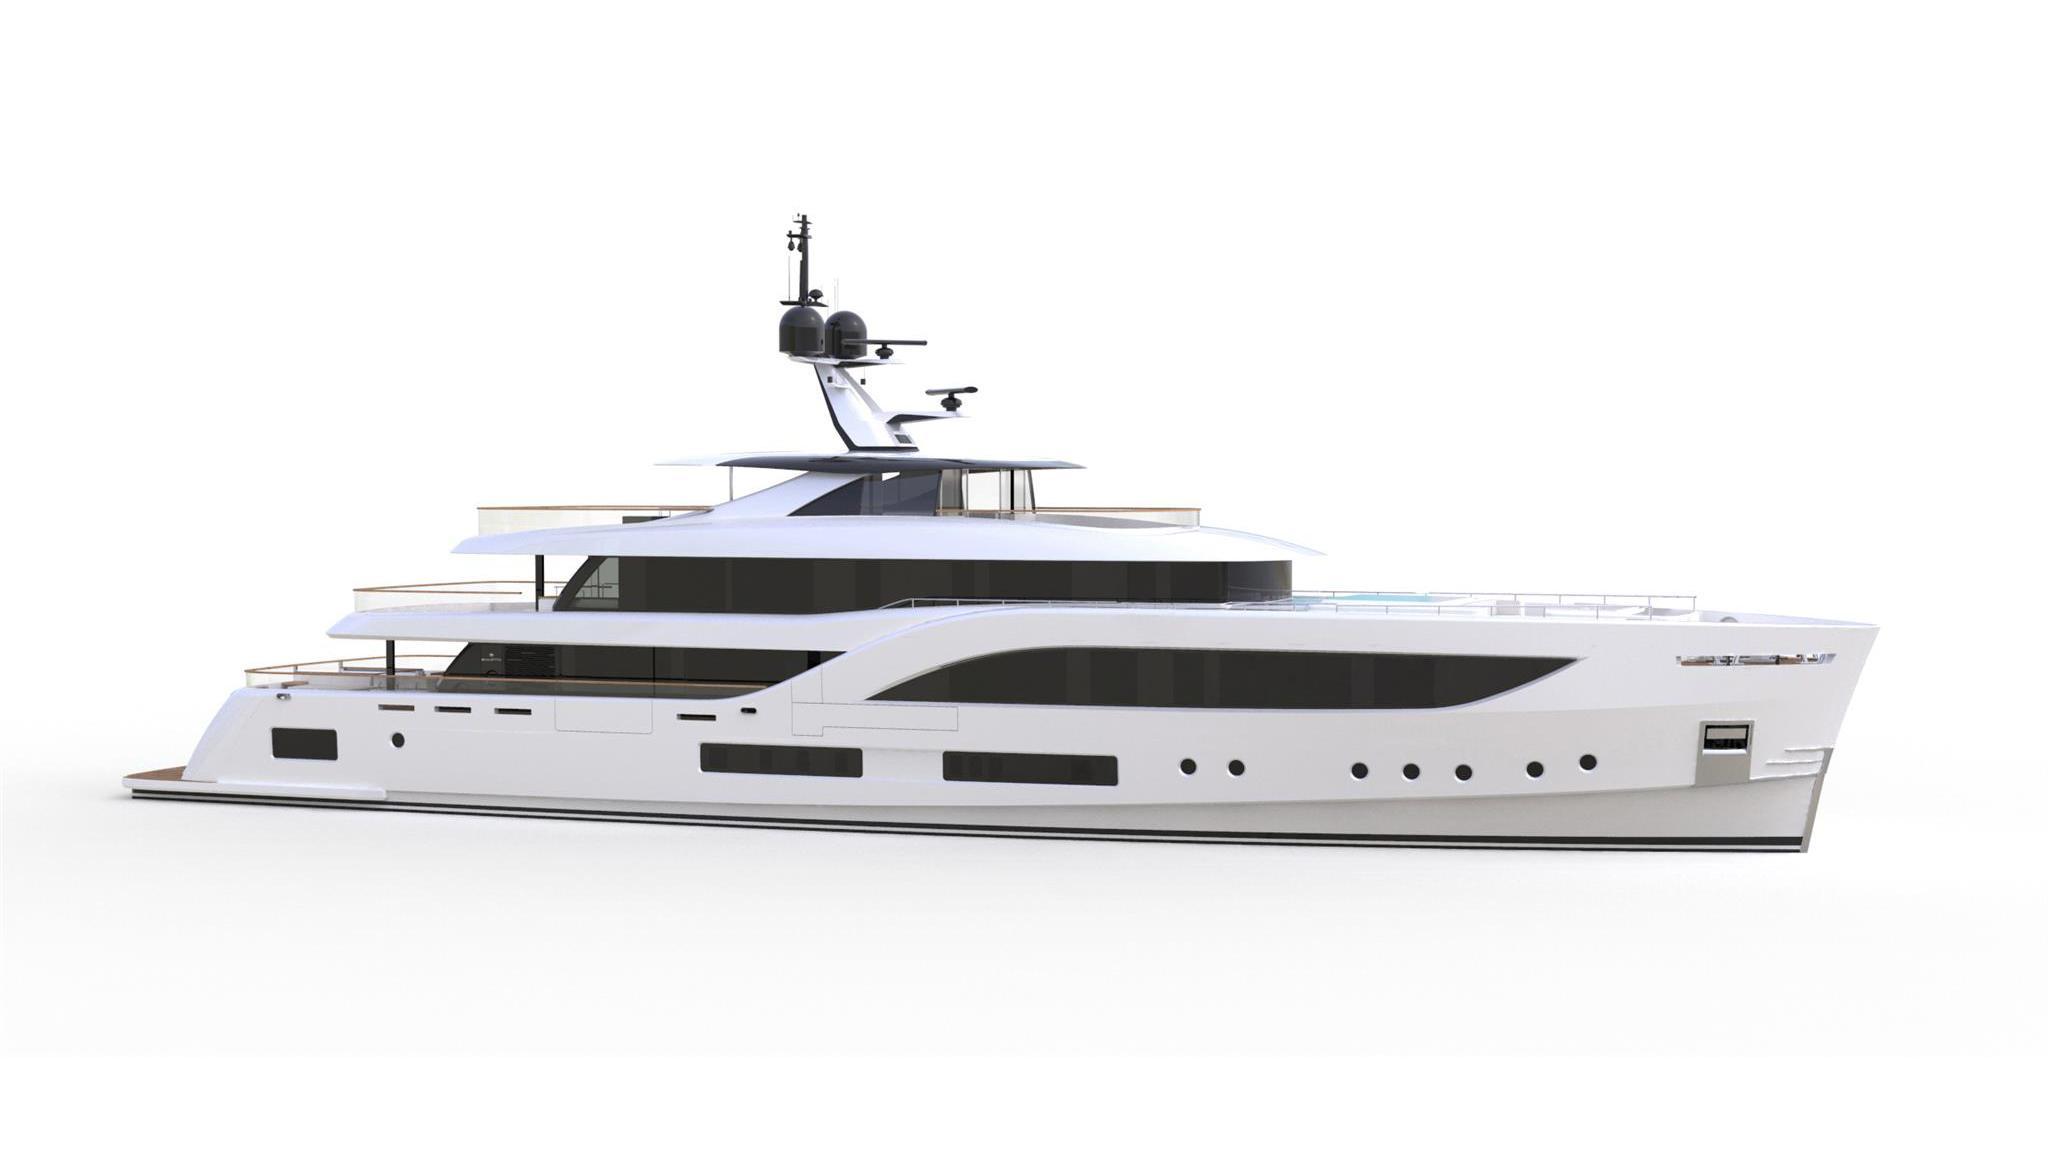 10231 motoryacht baglietto 54m 2020 rendering